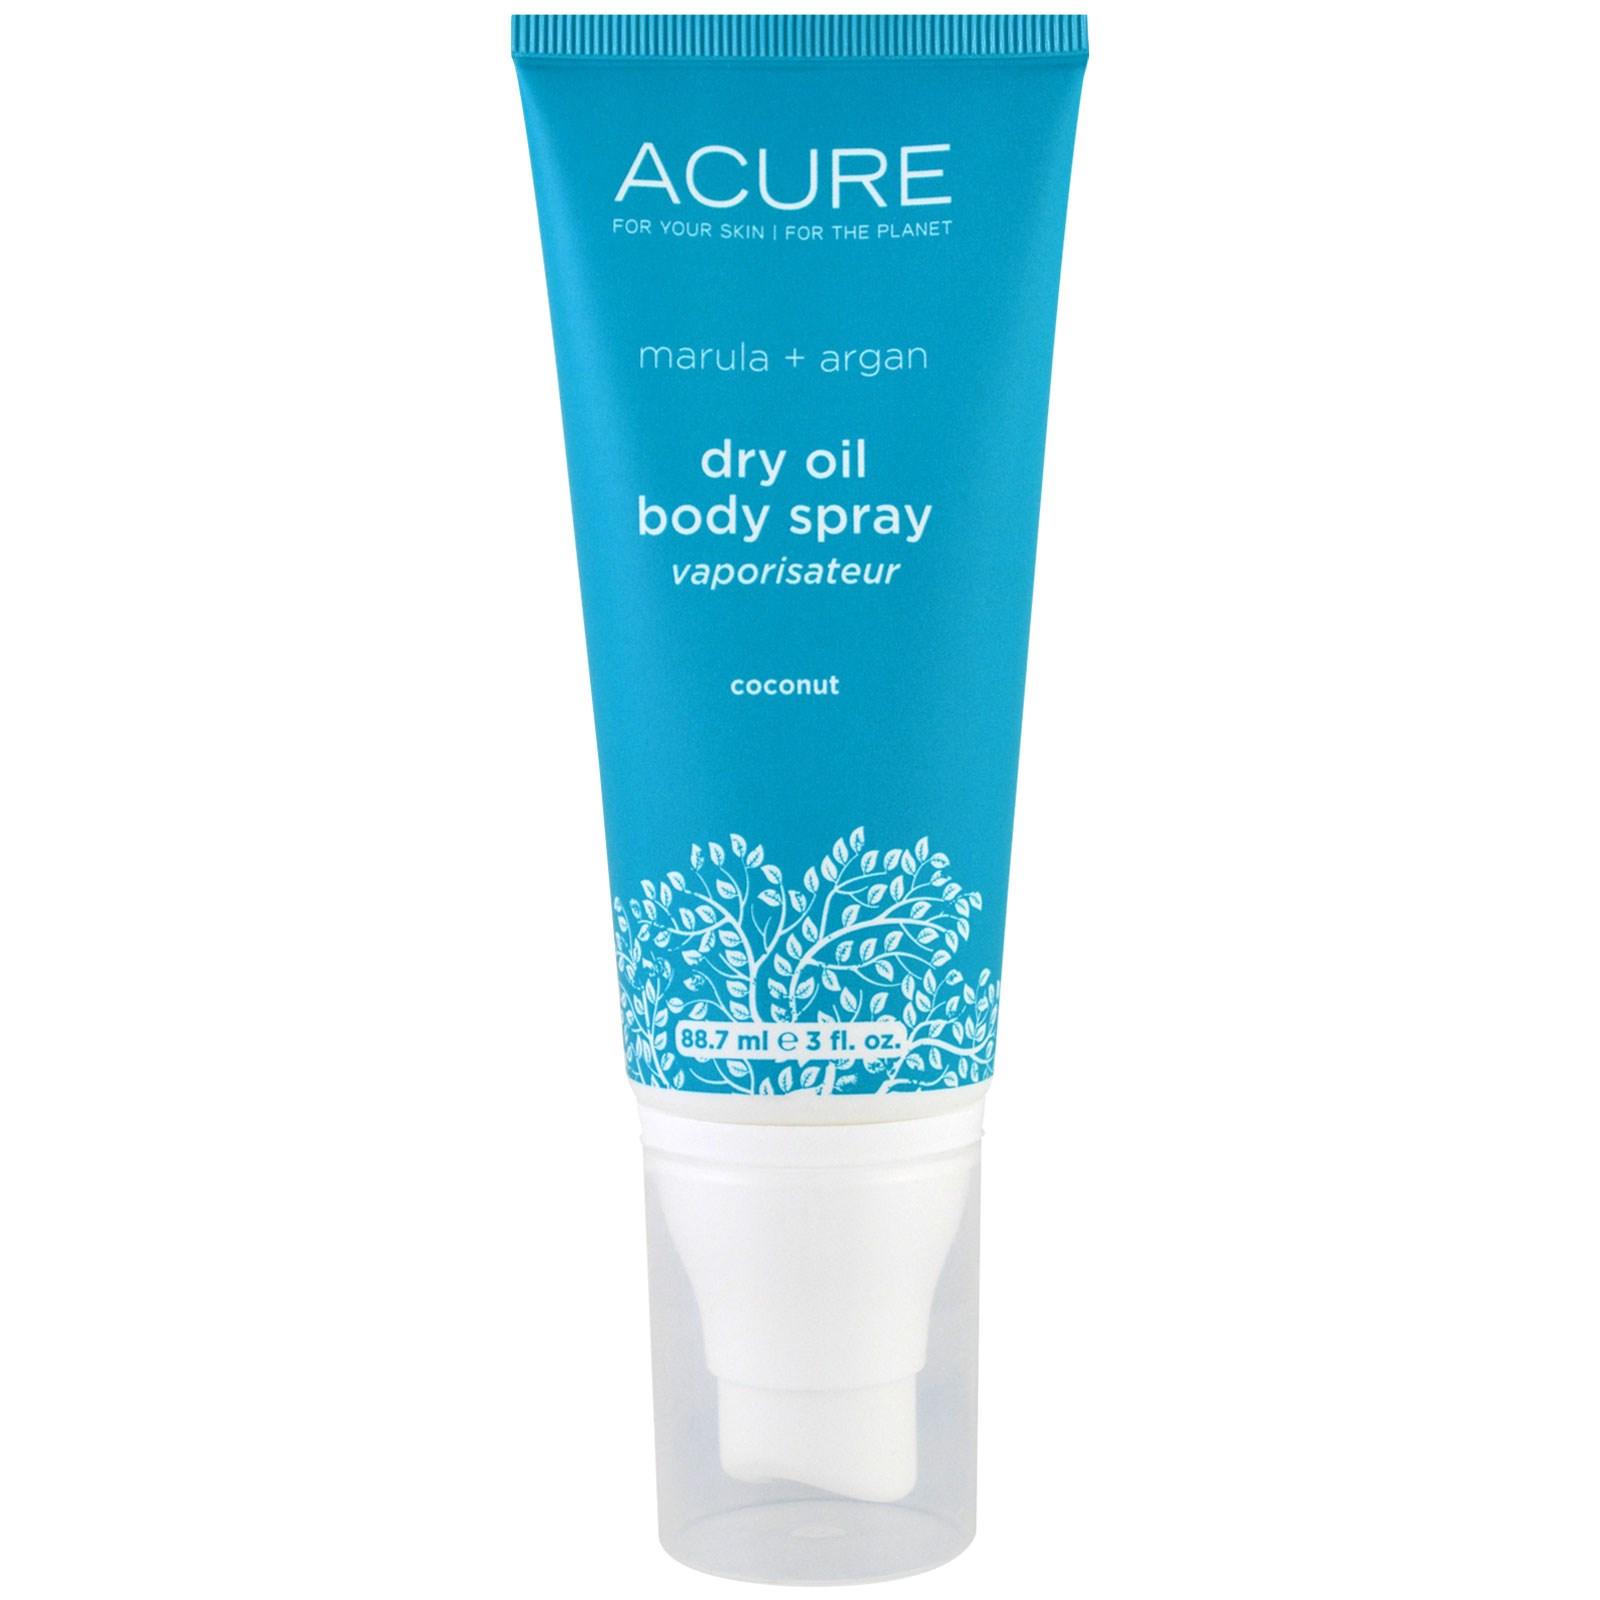 Acure Organics, Dry Oil Body Spray, Coconut, 3 Fl Oz (88.7